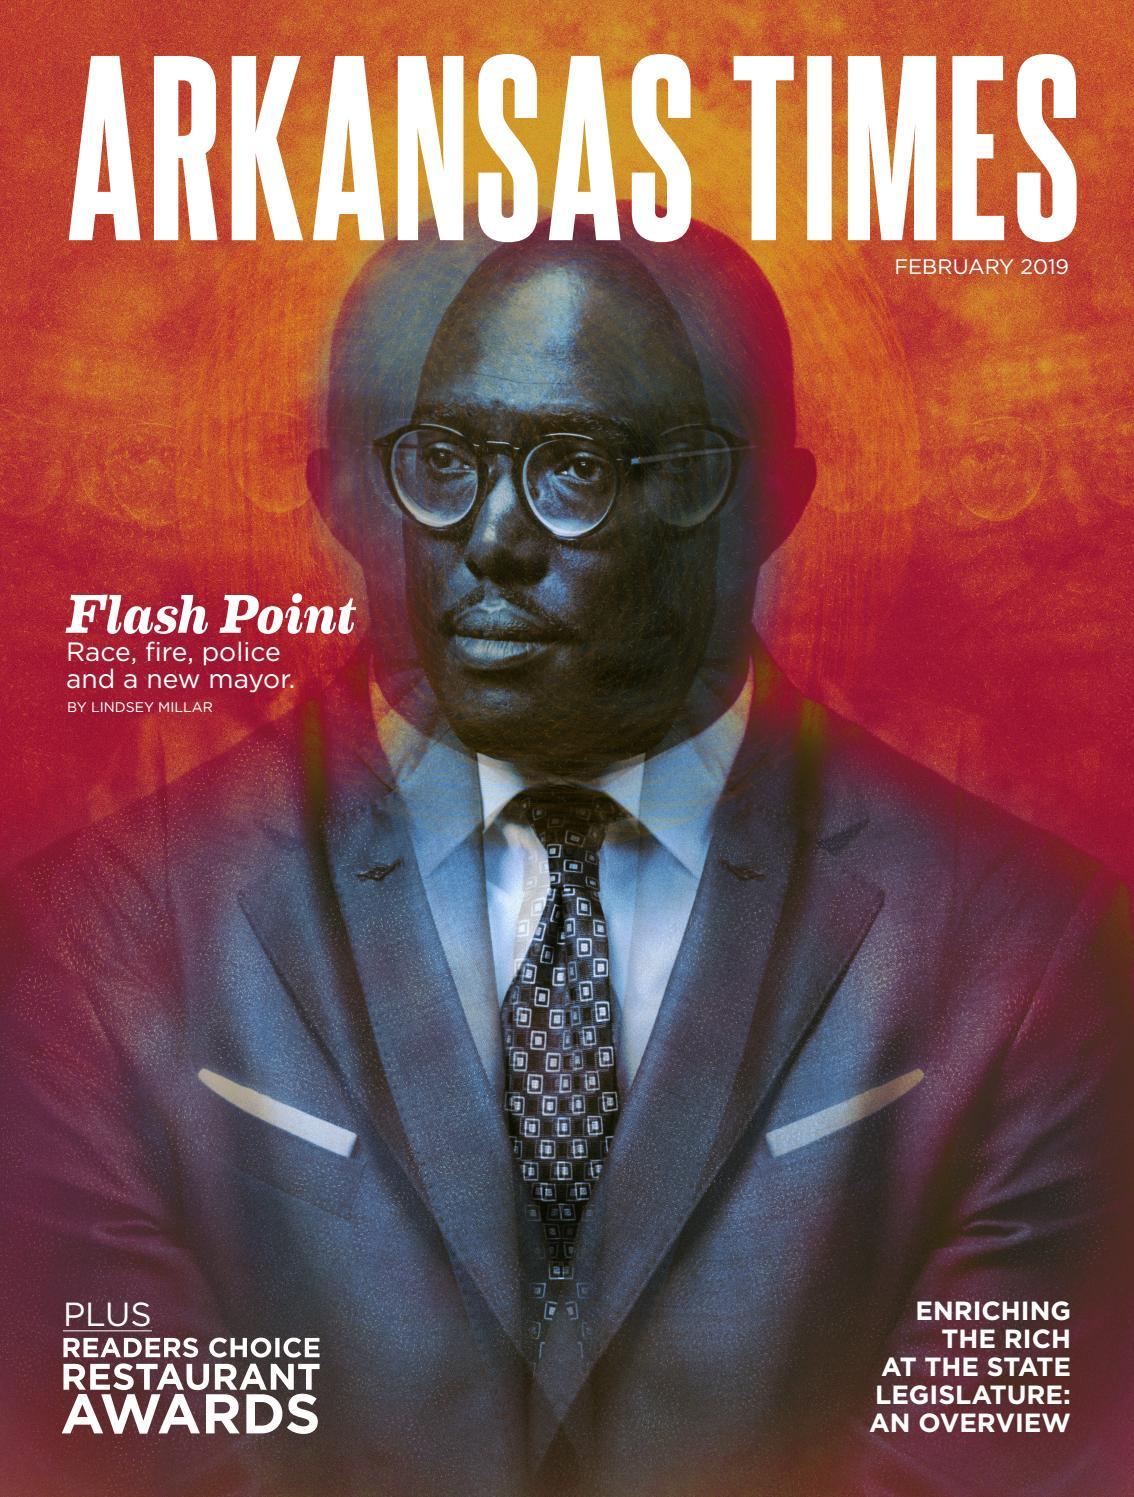 Alabama Arkansas I Sure Miss My Ma And Pa Lyrics arkansas times february 2019arkansas times - issuu